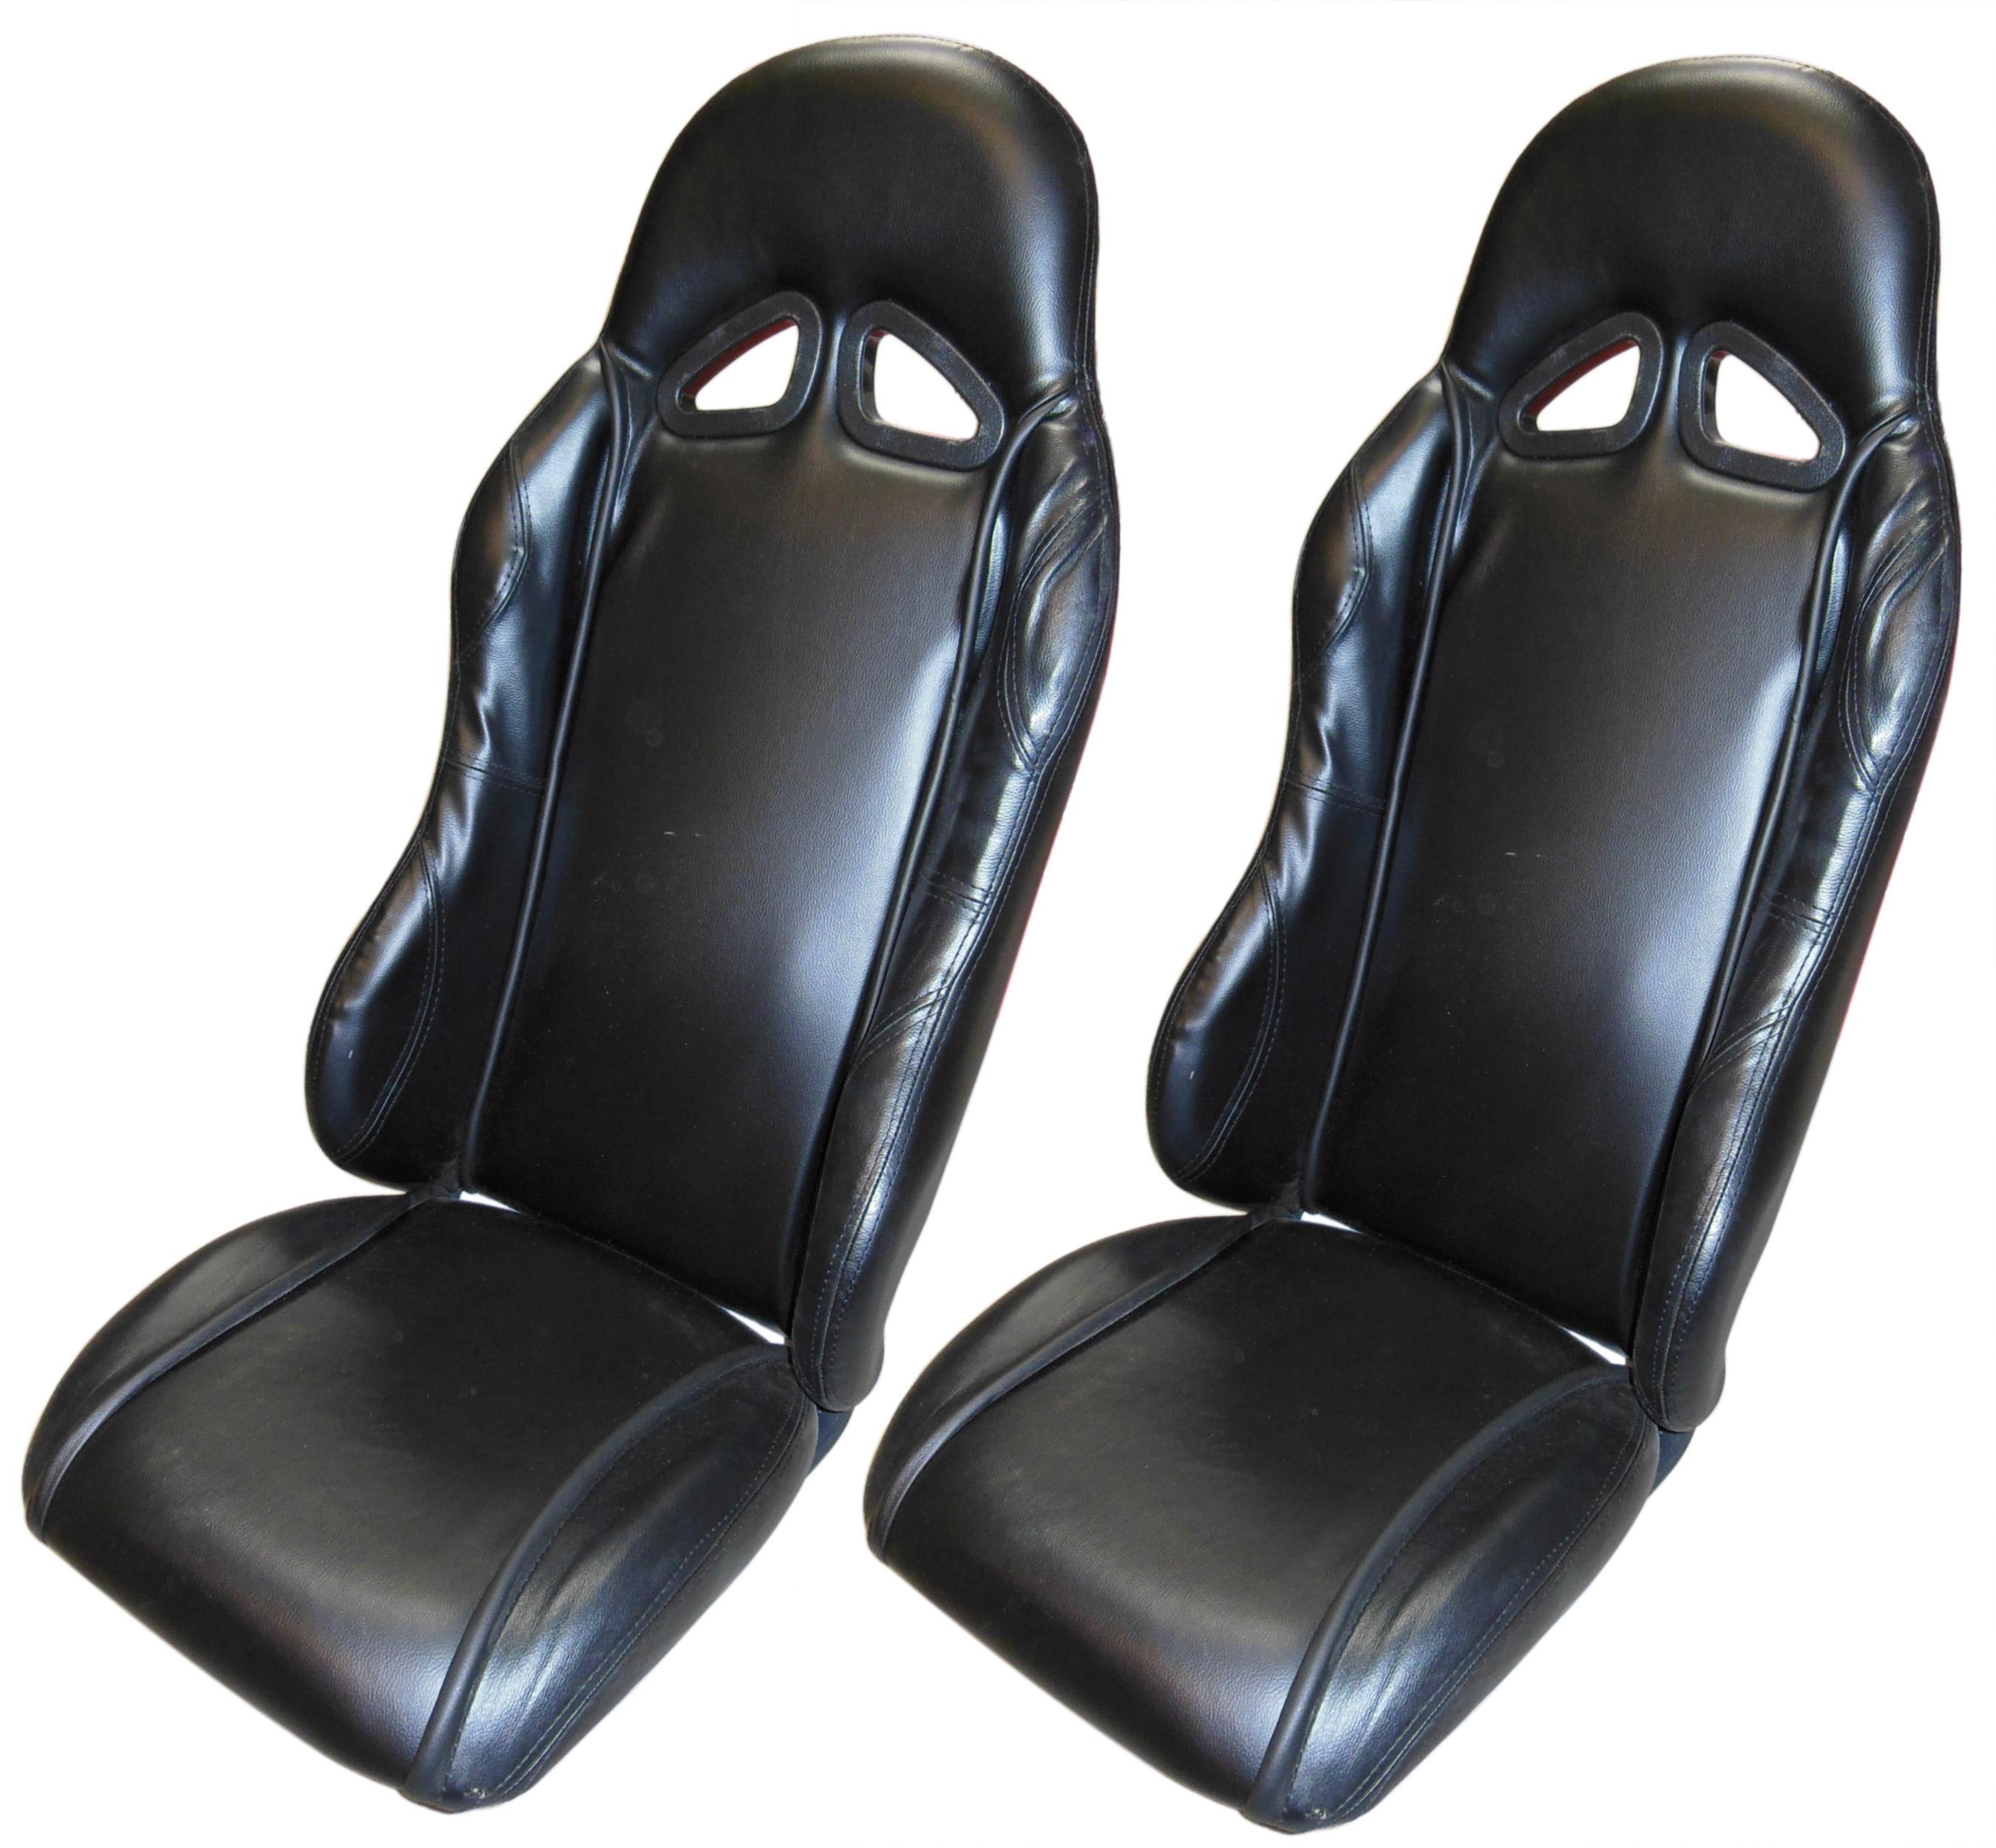 Padded Bucket Seat Set 2 For Go Kart 400549 Bmi